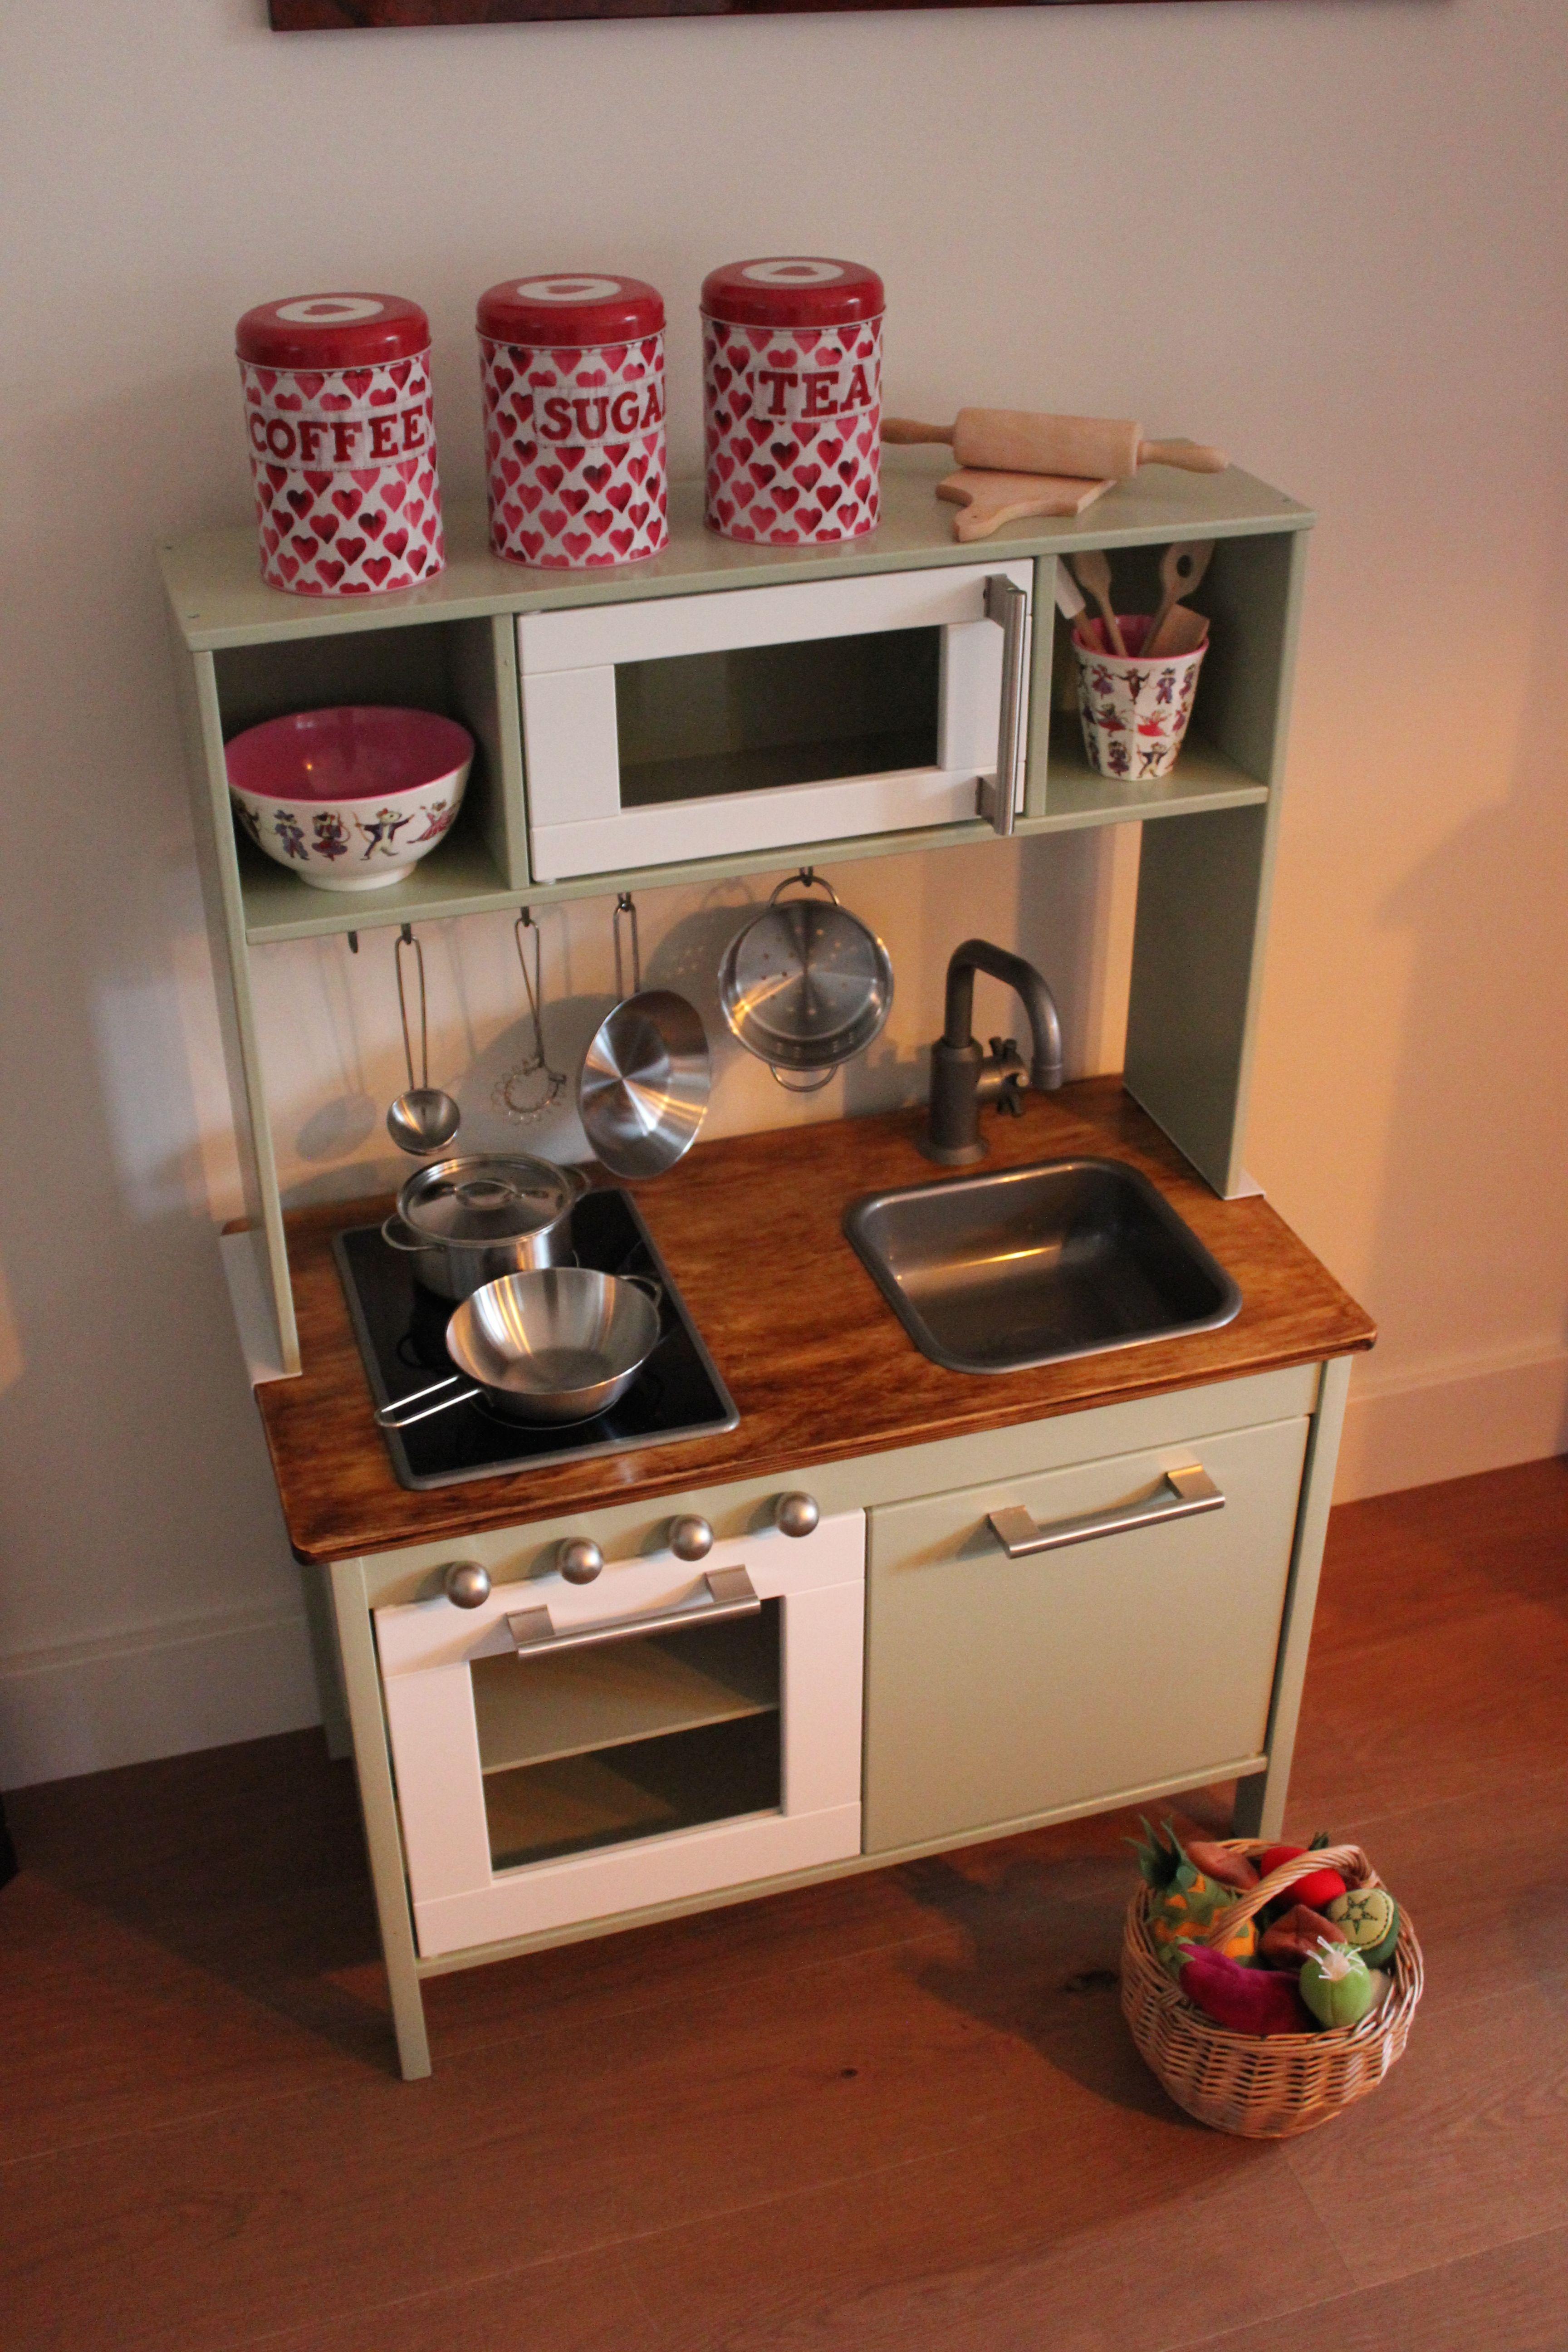 duktig ikea küche pimpen | ikea kinderküche pimpen